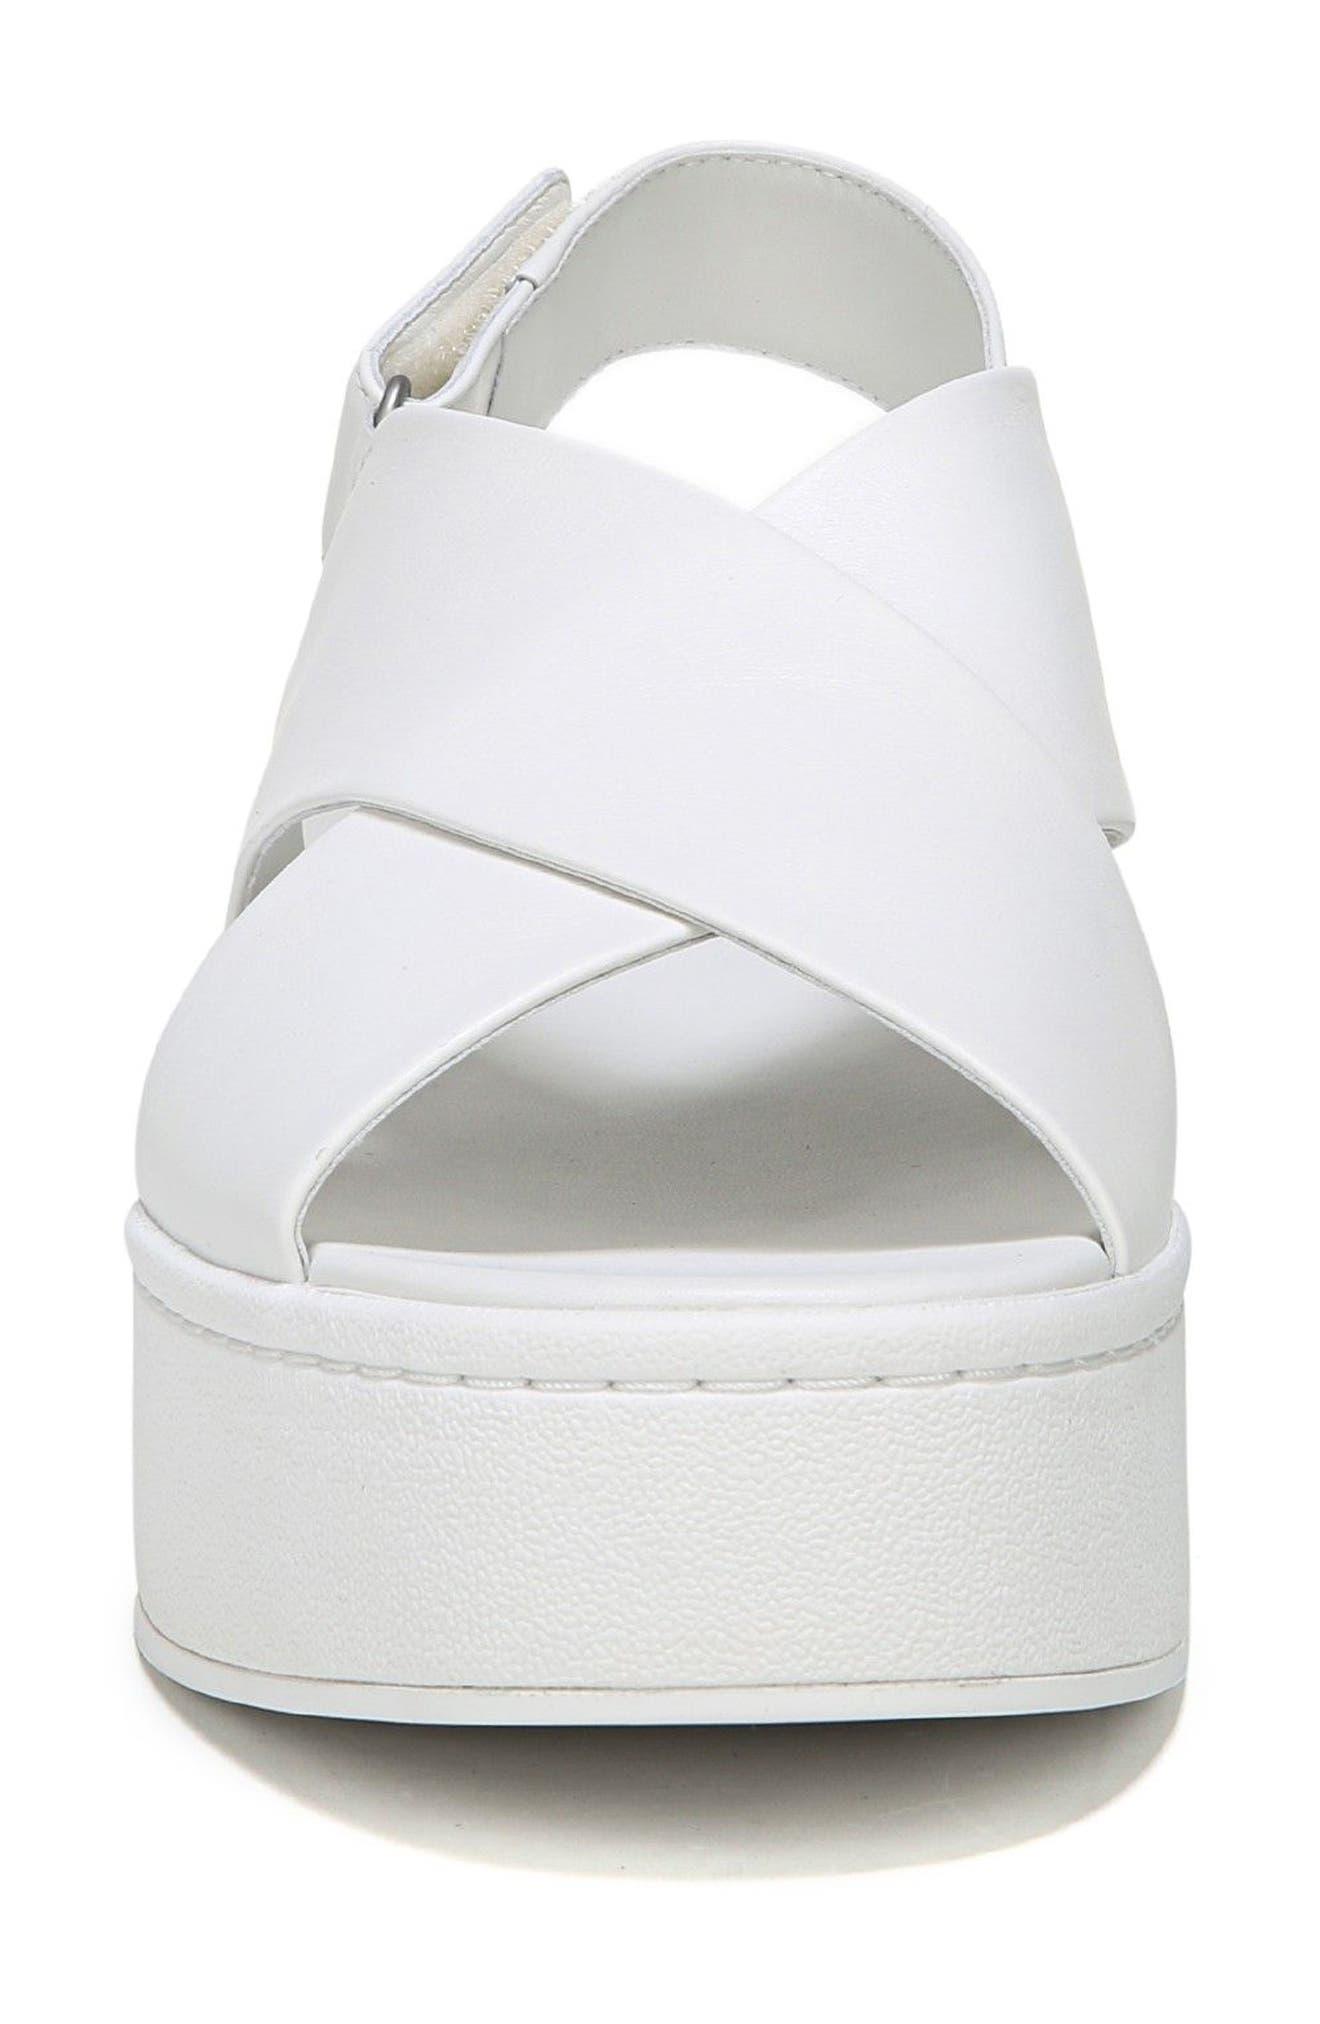 Weslan Cross Strap Slingback Sandal,                             Alternate thumbnail 4, color,                             Horchata